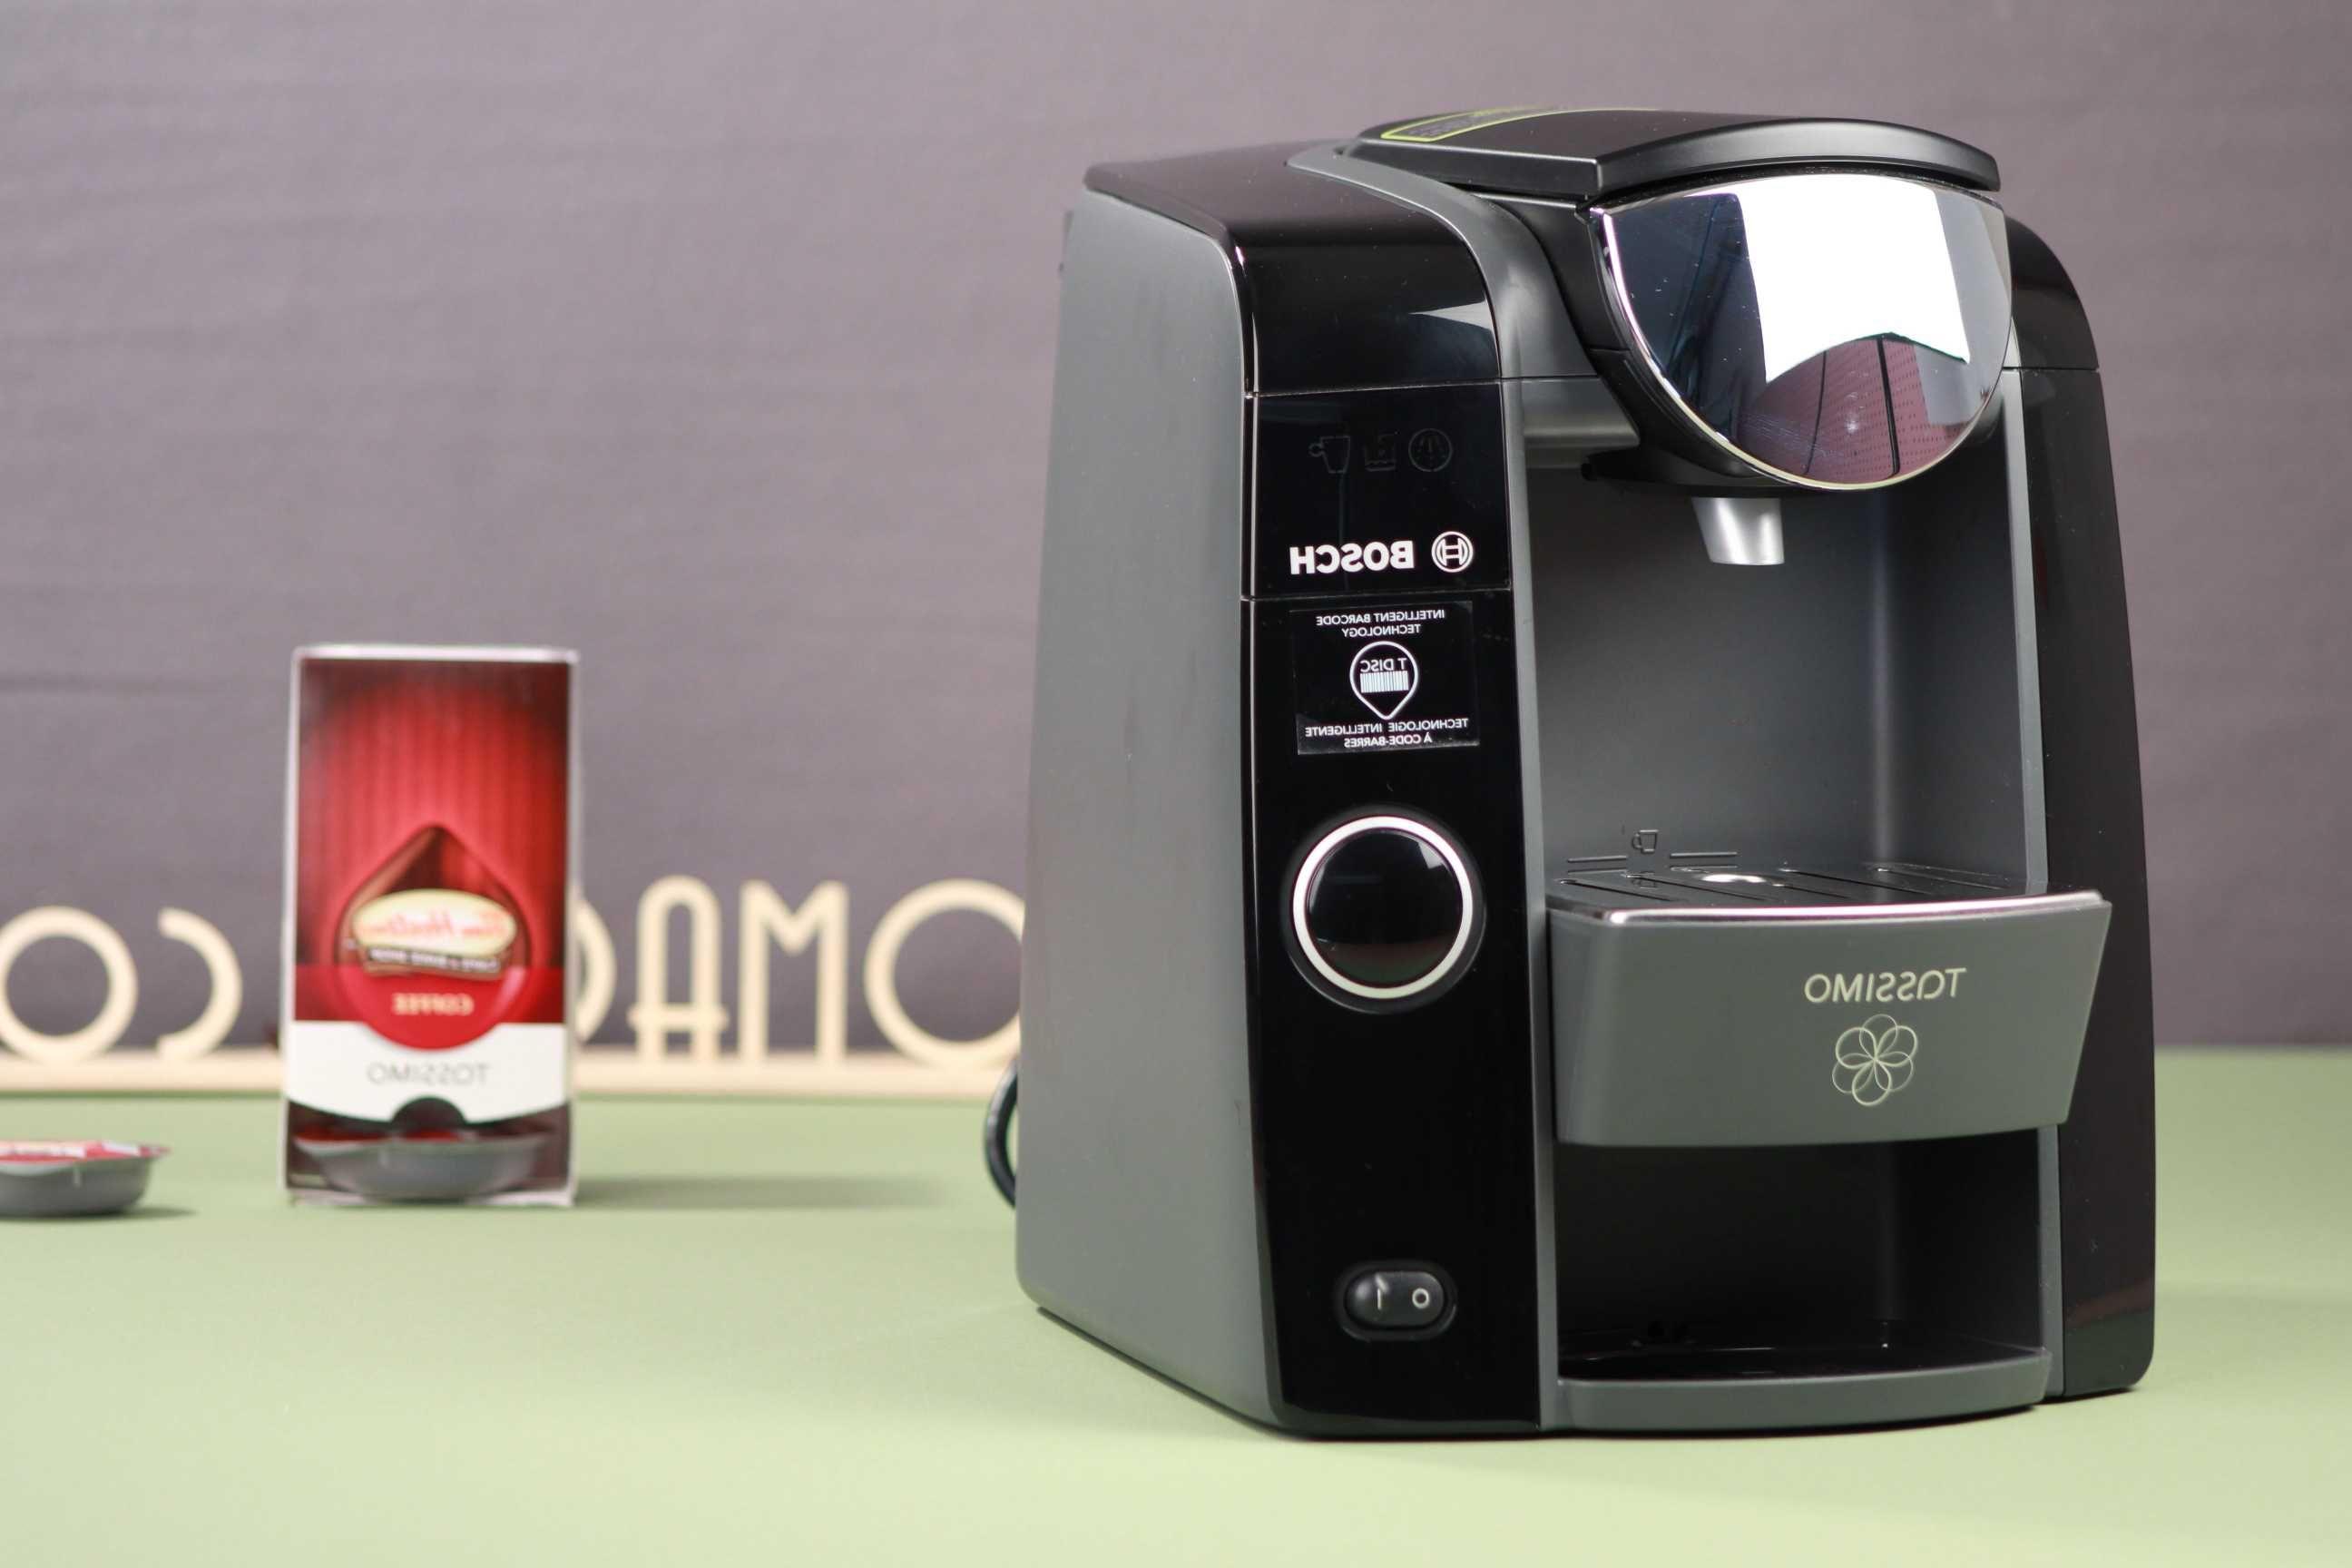 New Tassimo Coffee Maker Black Friday Sale